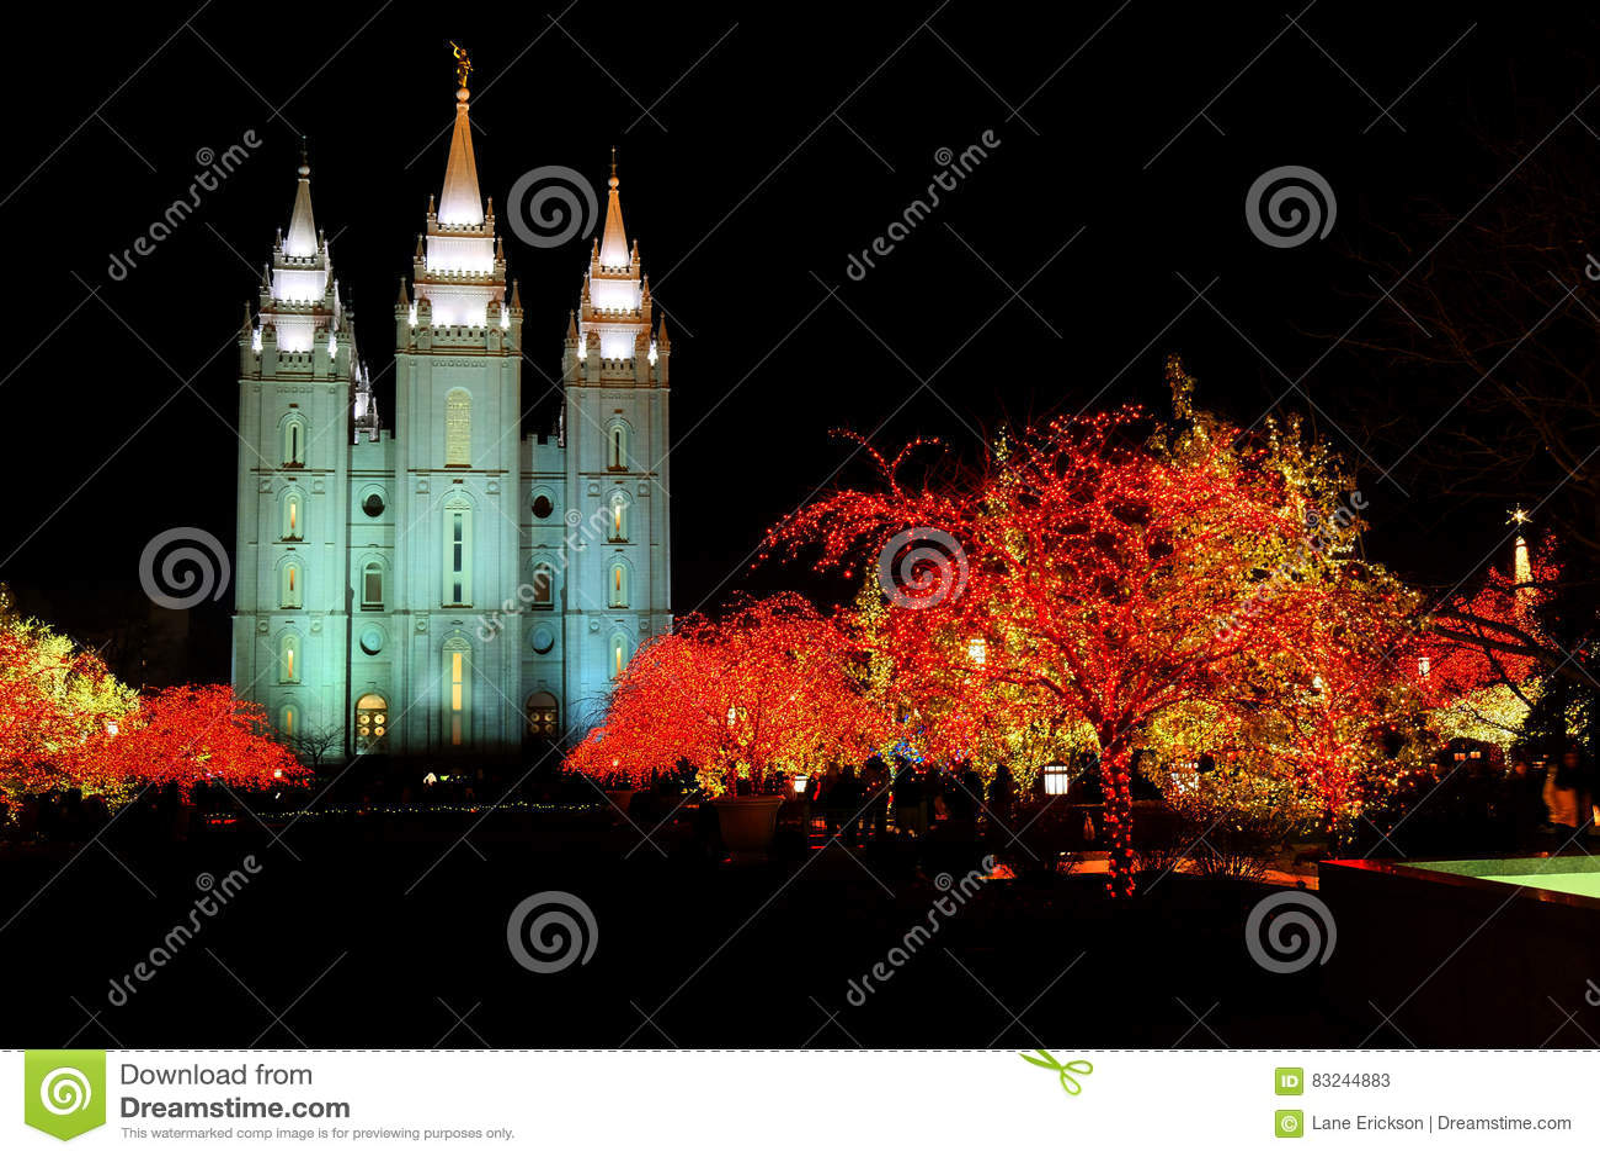 Temple Square Salt Lake City Utah With Christmas Lights Stock Image ...